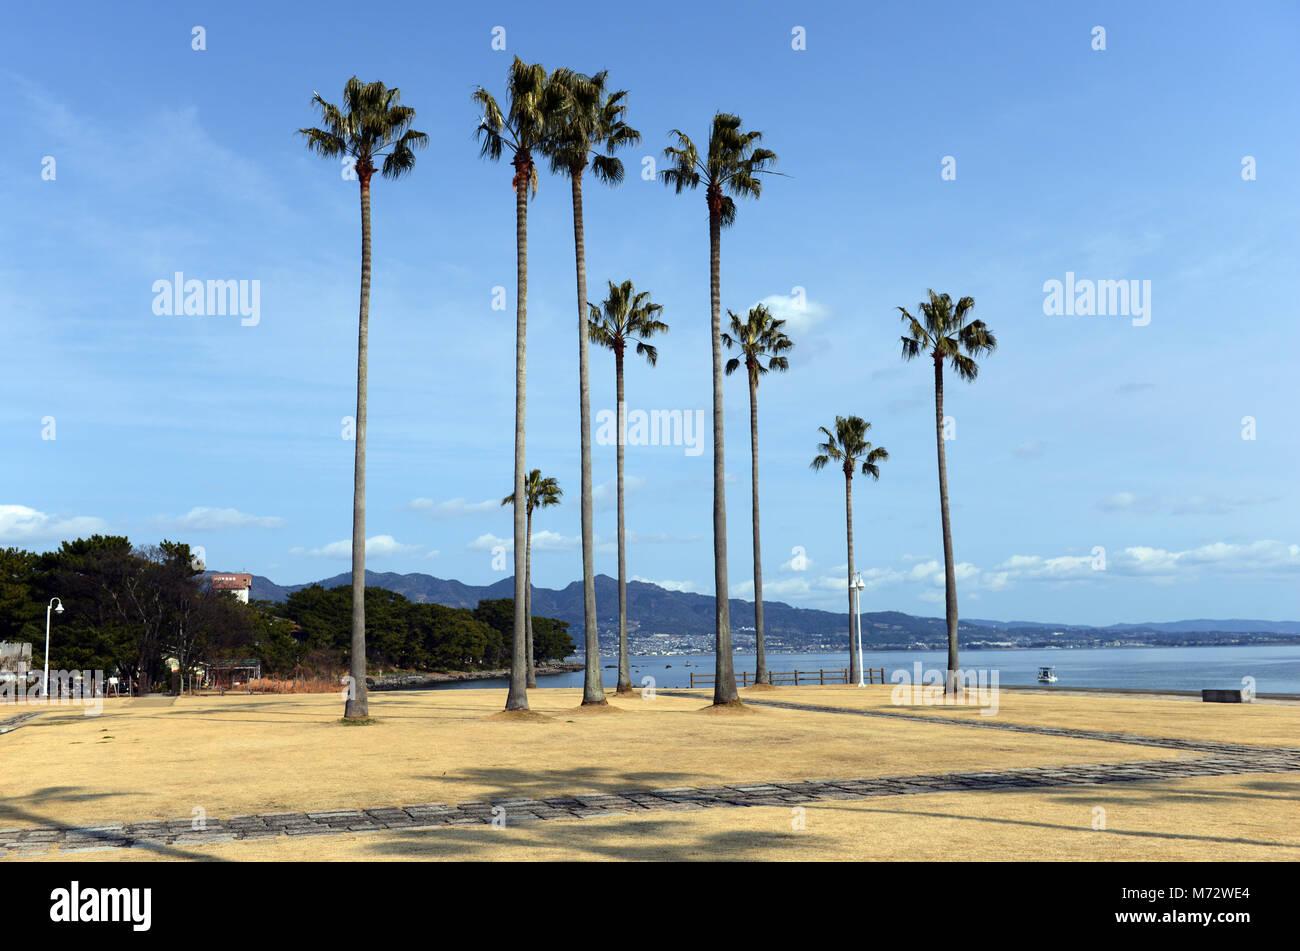 Shoningahama Park in Beppu, Japan. - Stock Image